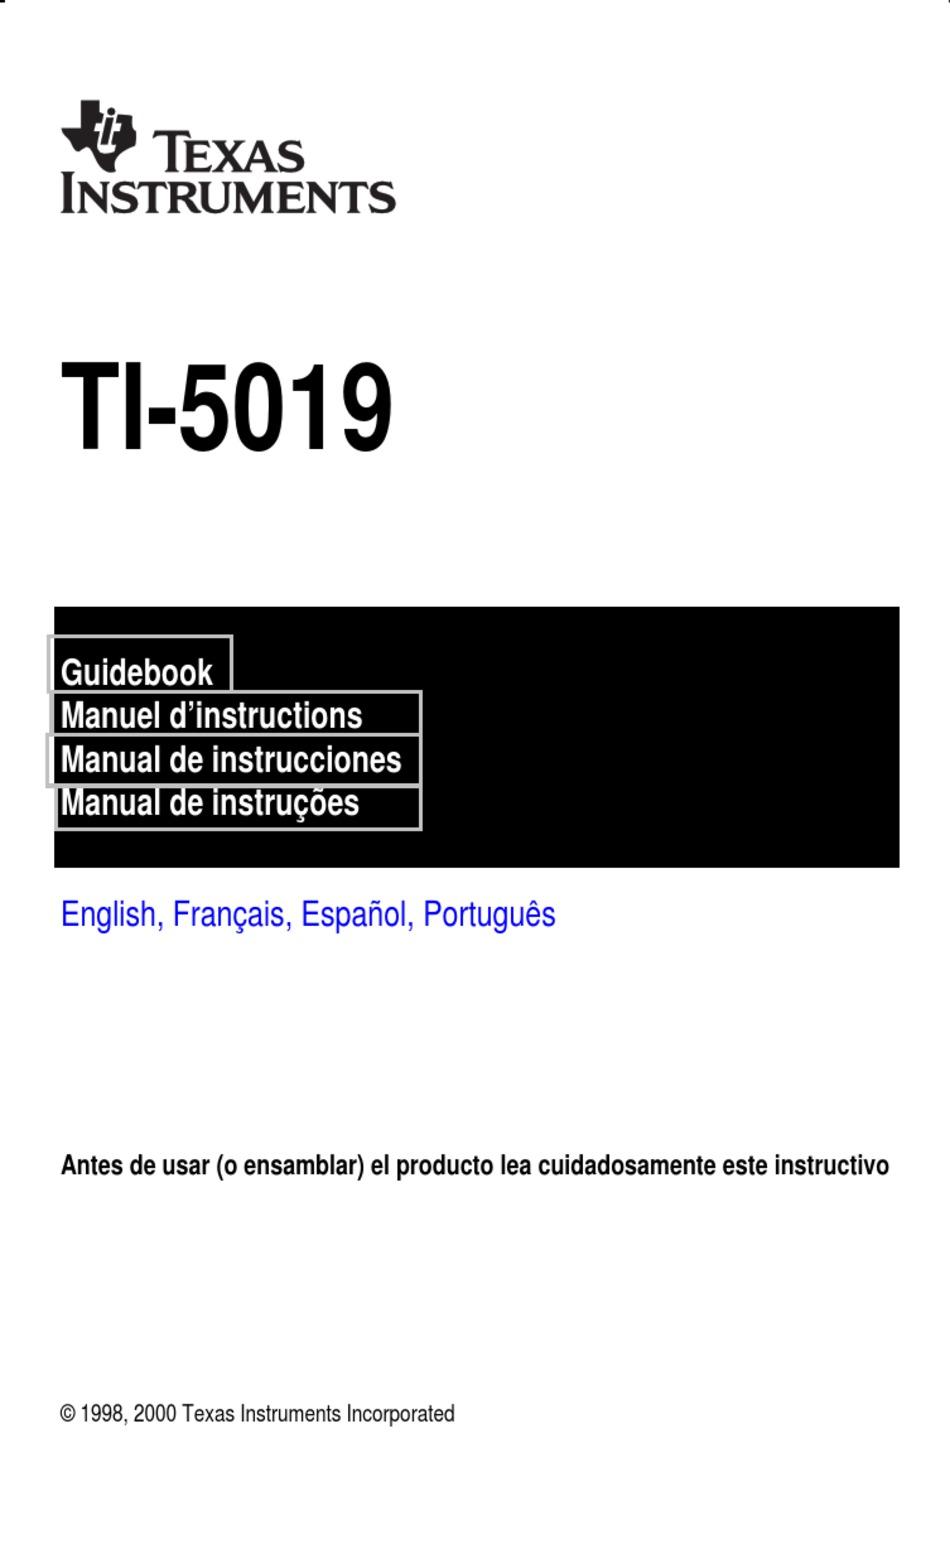 TEXAS INSTRUMENTS TI-5019 MANUAL BOOK Pdf Download